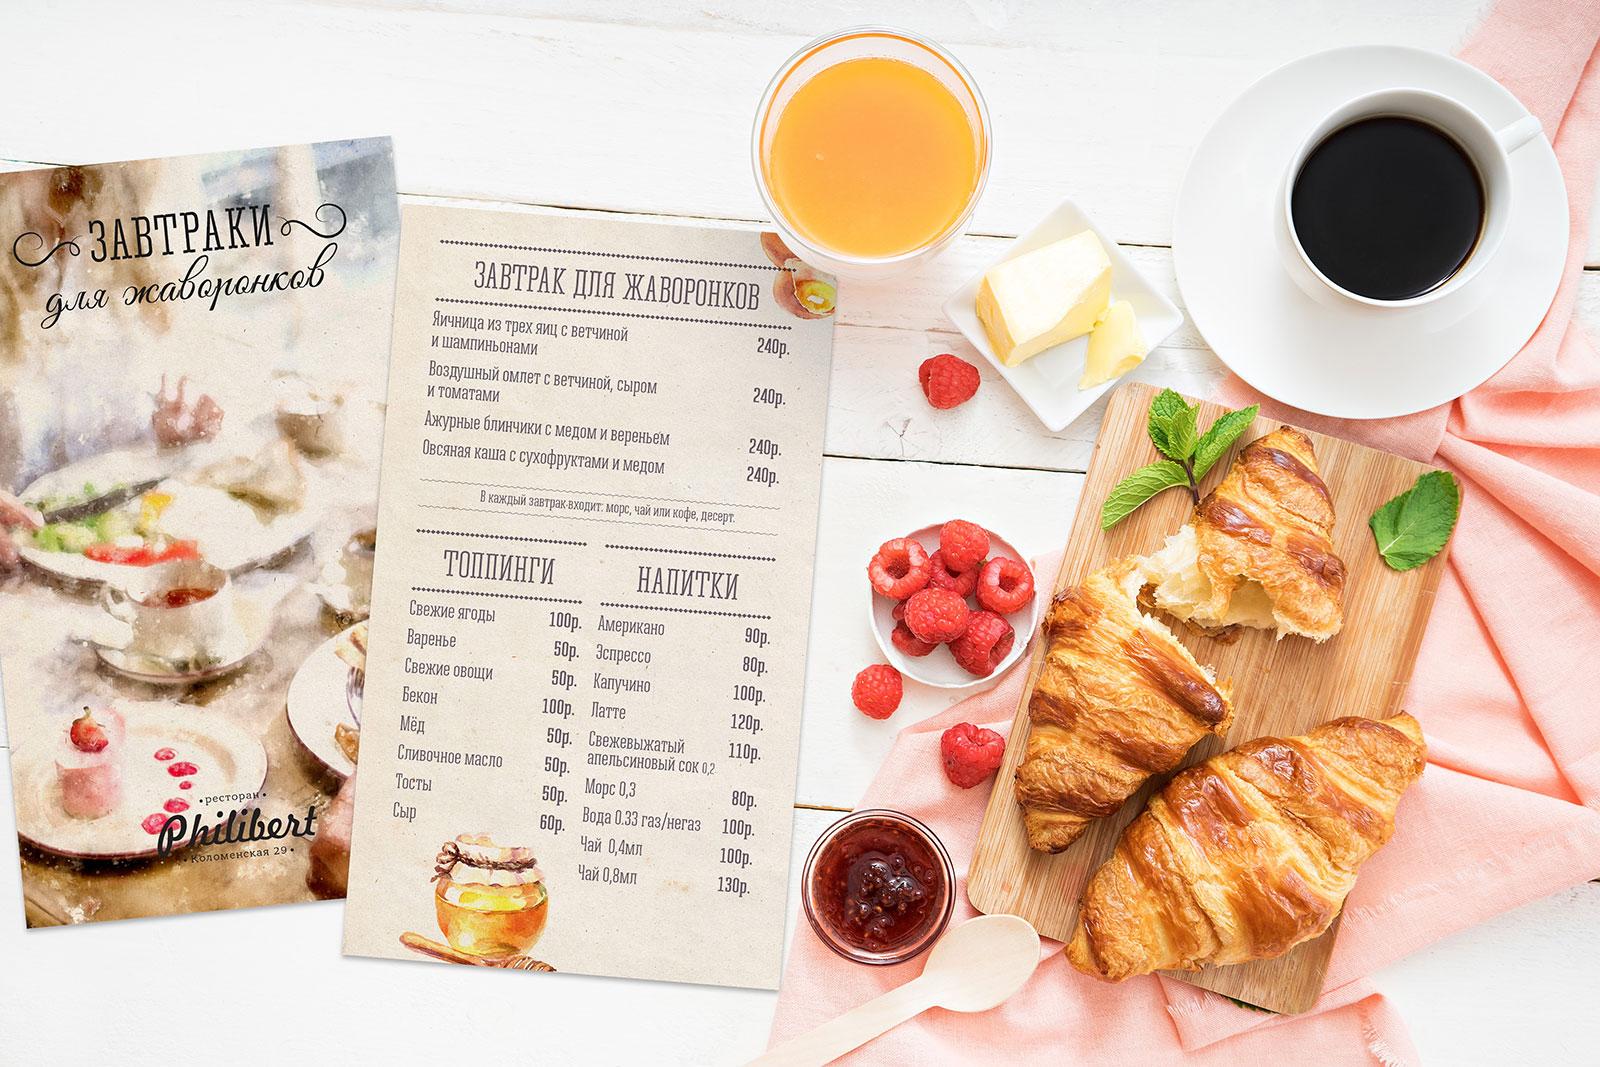 Меню завтраков кафе Philibert